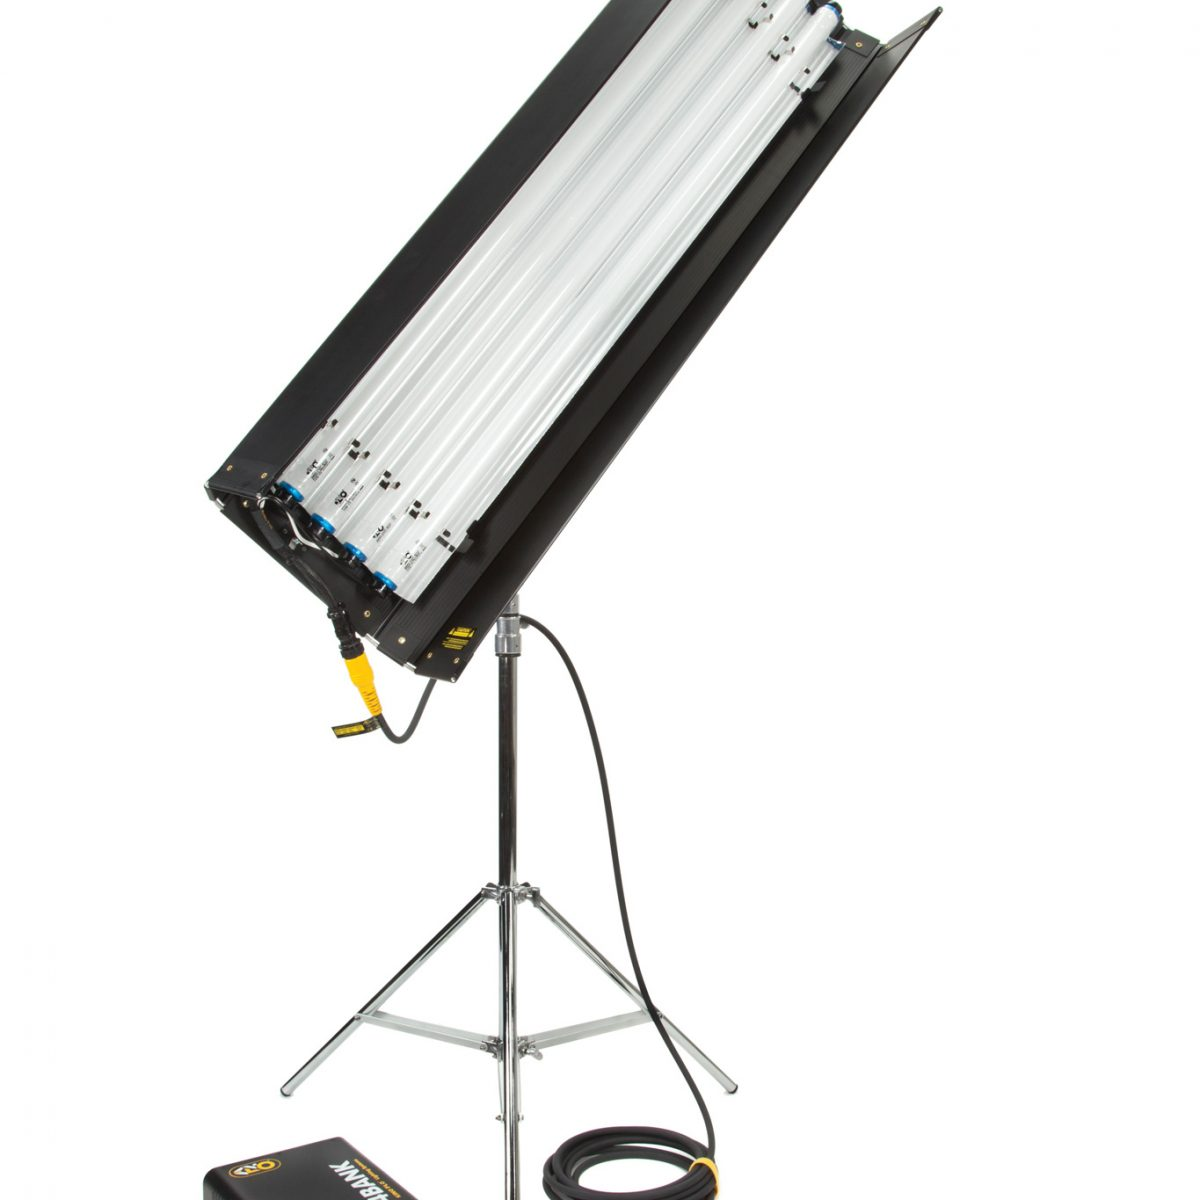 Kino Flo 4ft 4Bank System, (HP) Universal 230U